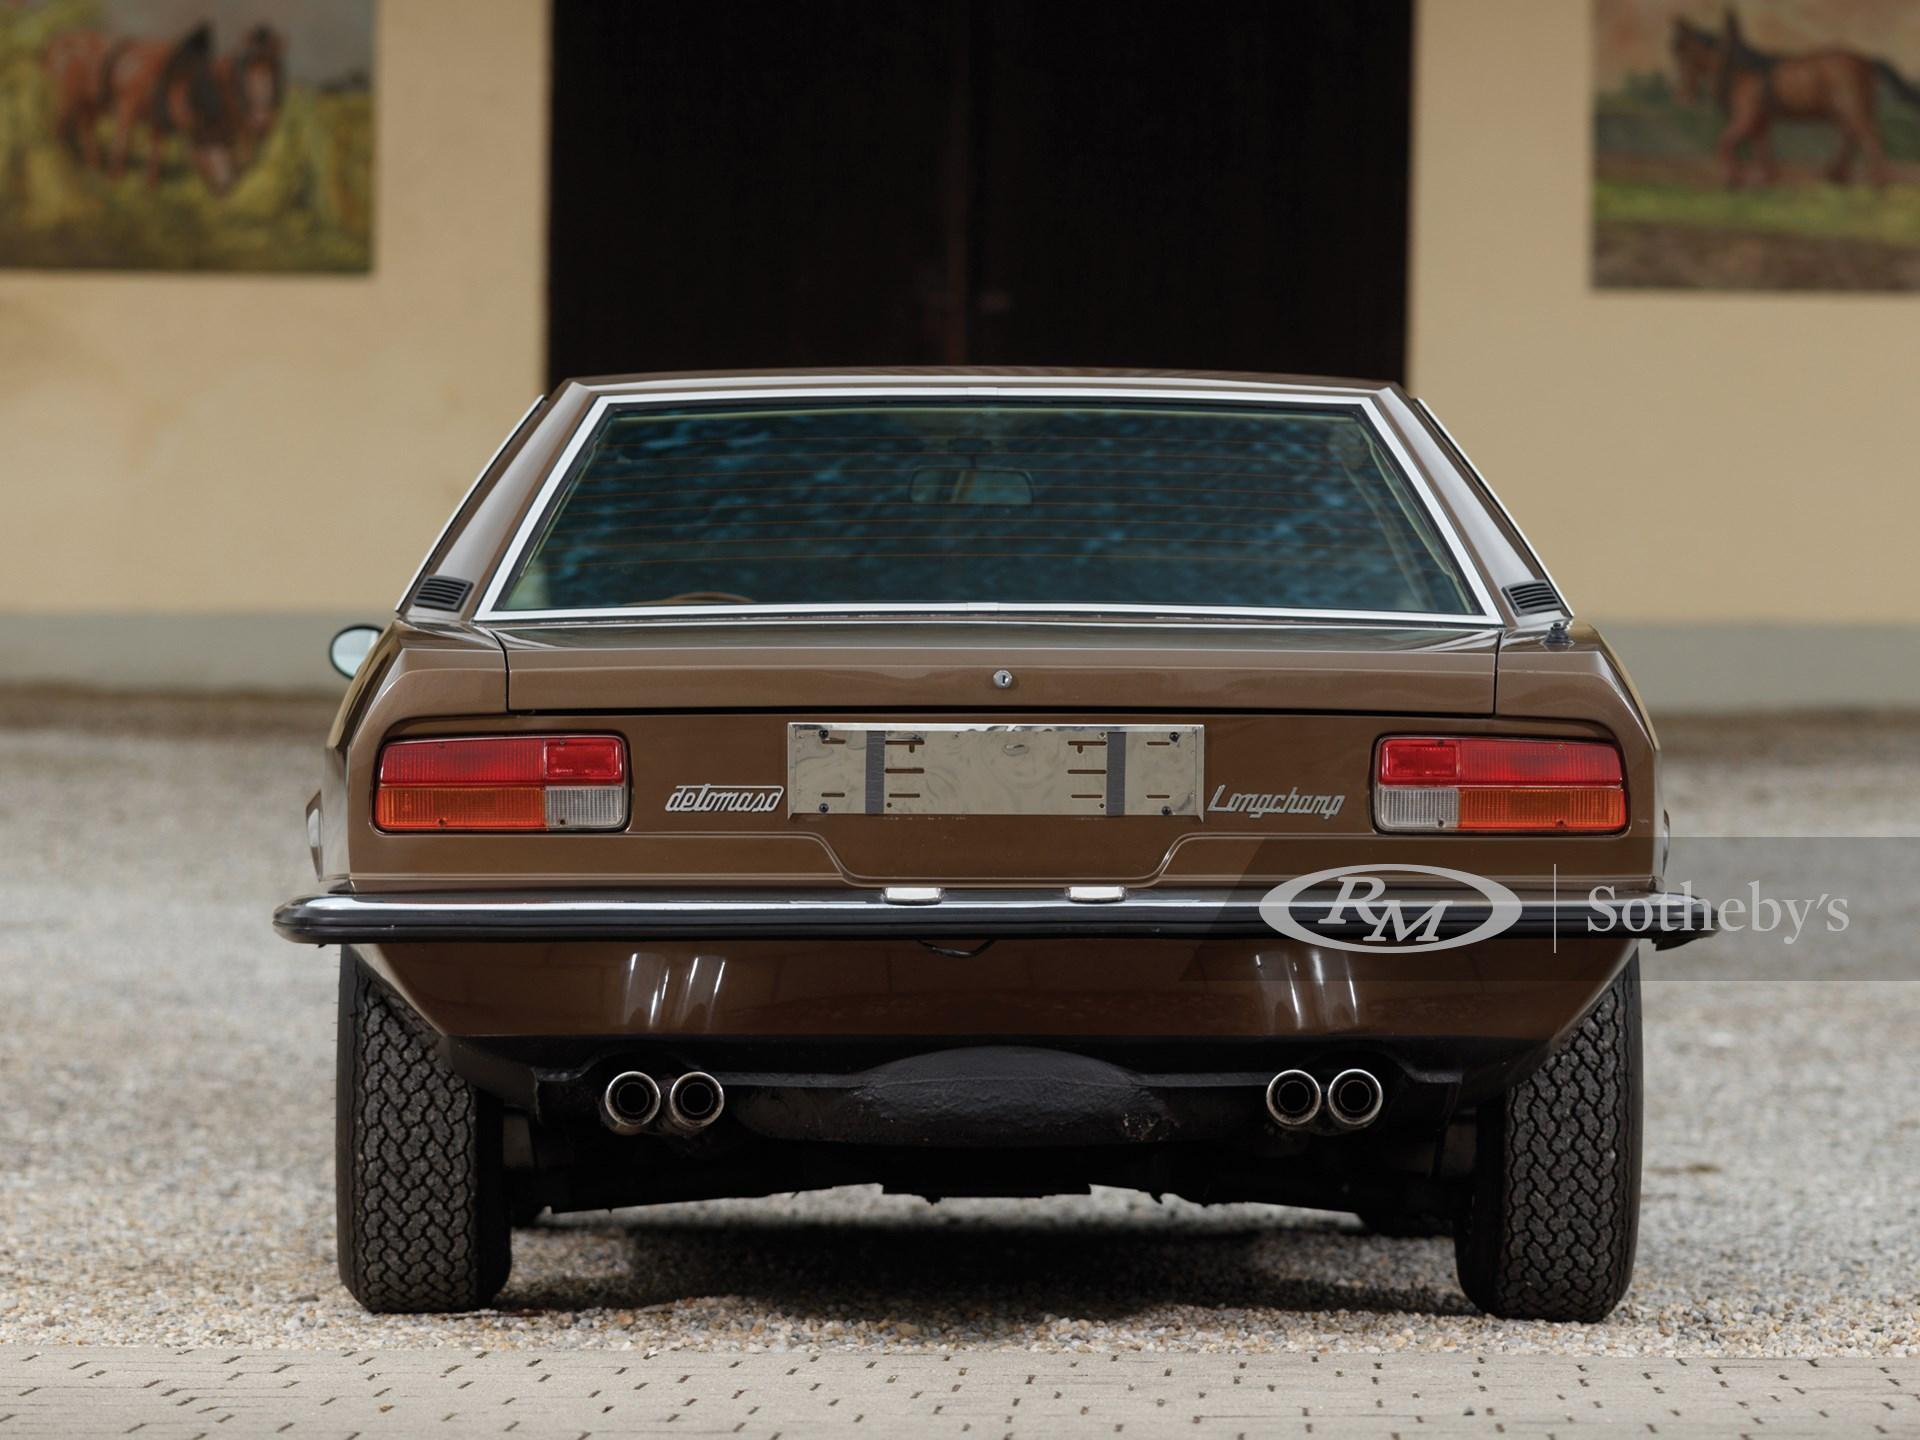 1978 De Tomaso Longchamp  -